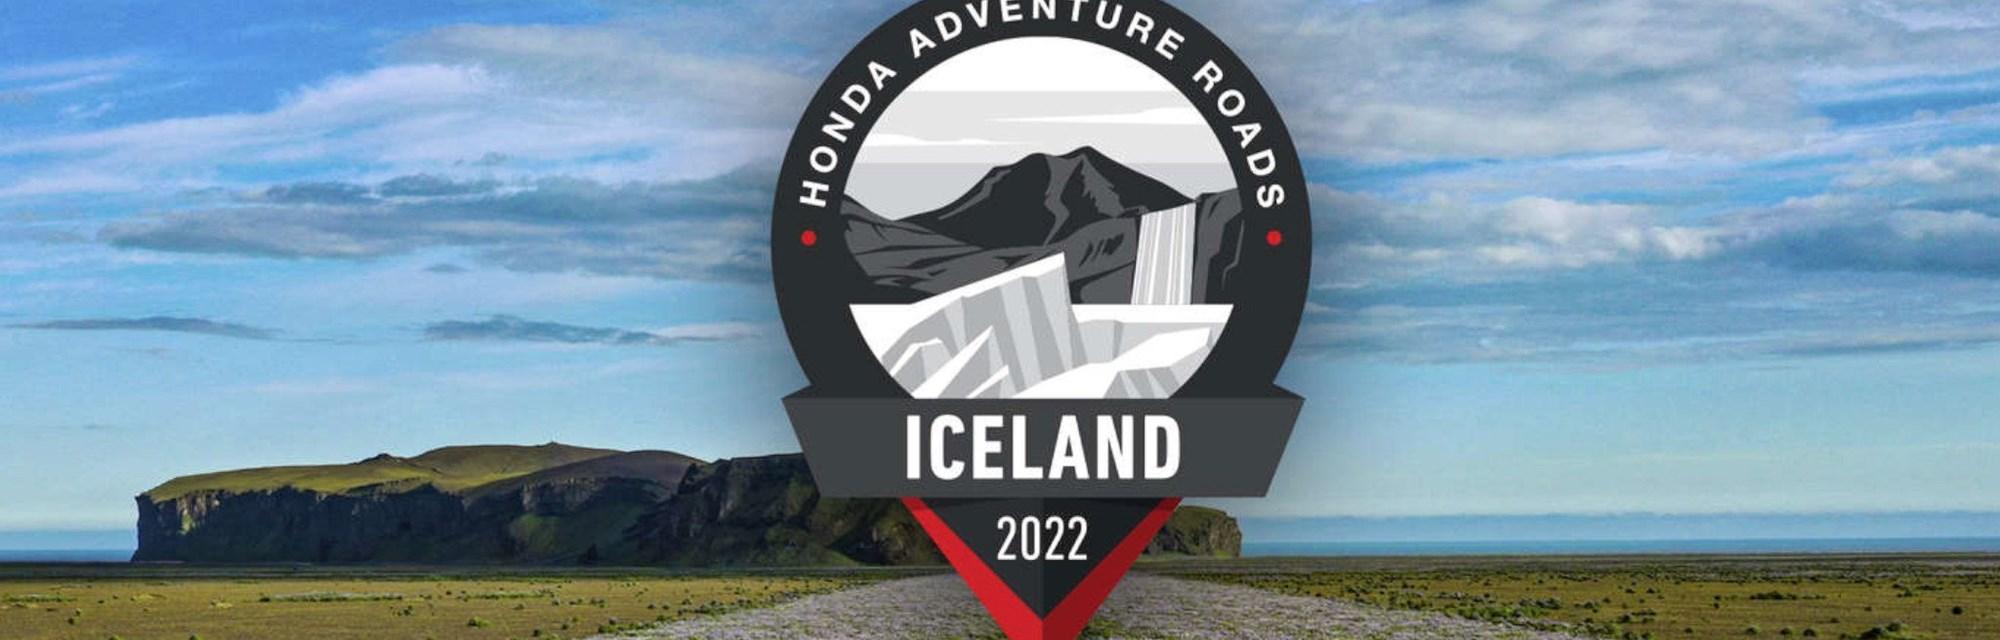 Adventure Roads 2021